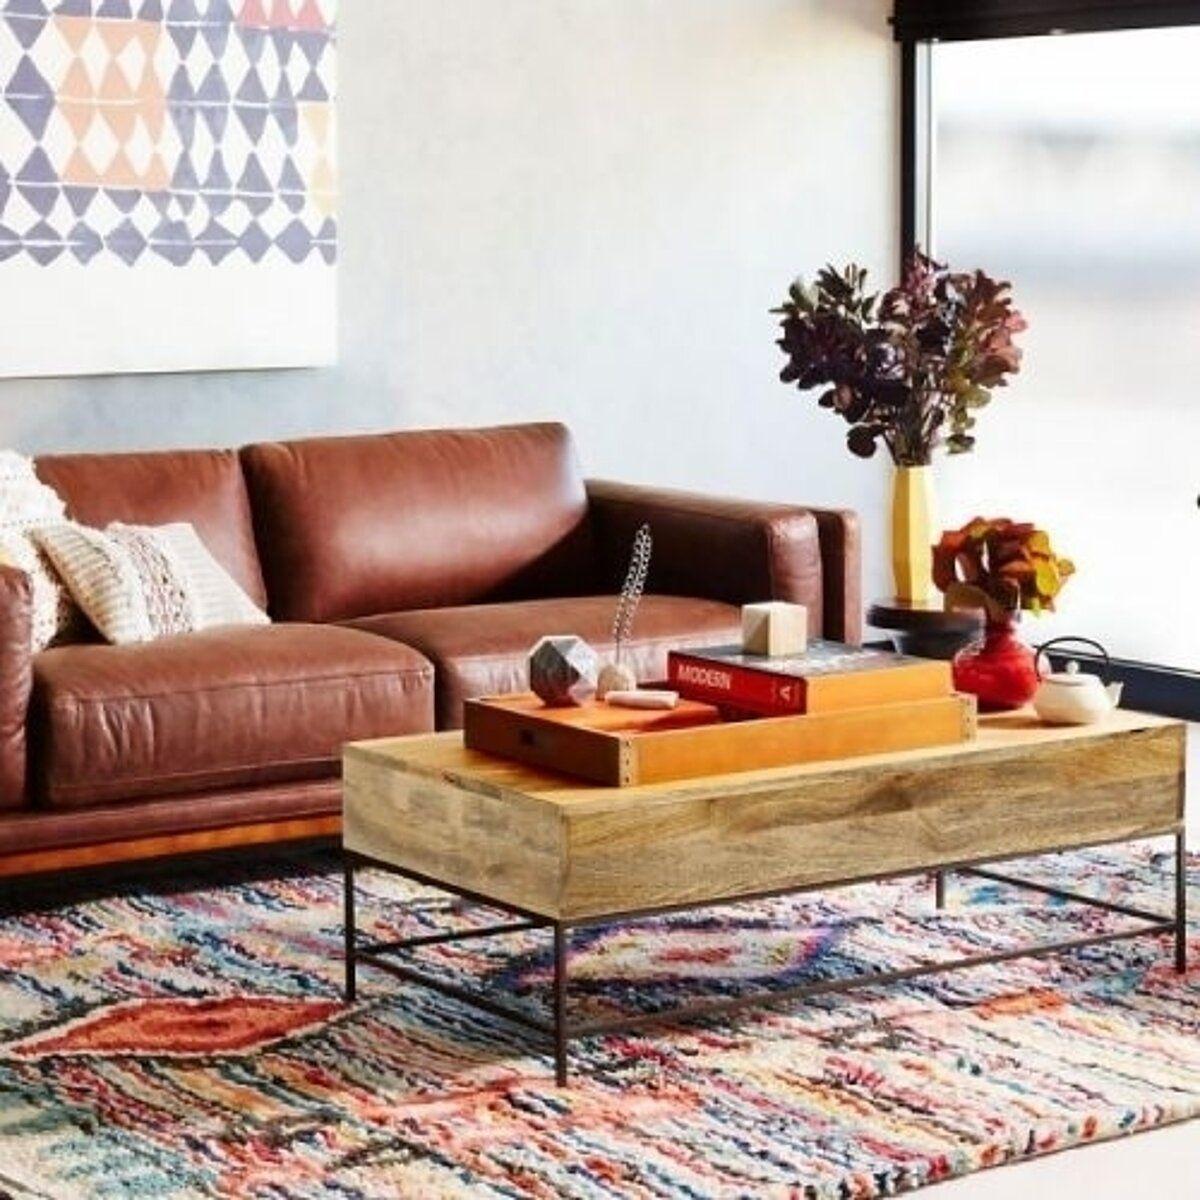 Saltoro Sherpi Mango Wood Coffee Table With 2 Drawers Brown And Black Coffee Table Wood Coffee Table Coffee Table With Storage [ 1200 x 1200 Pixel ]